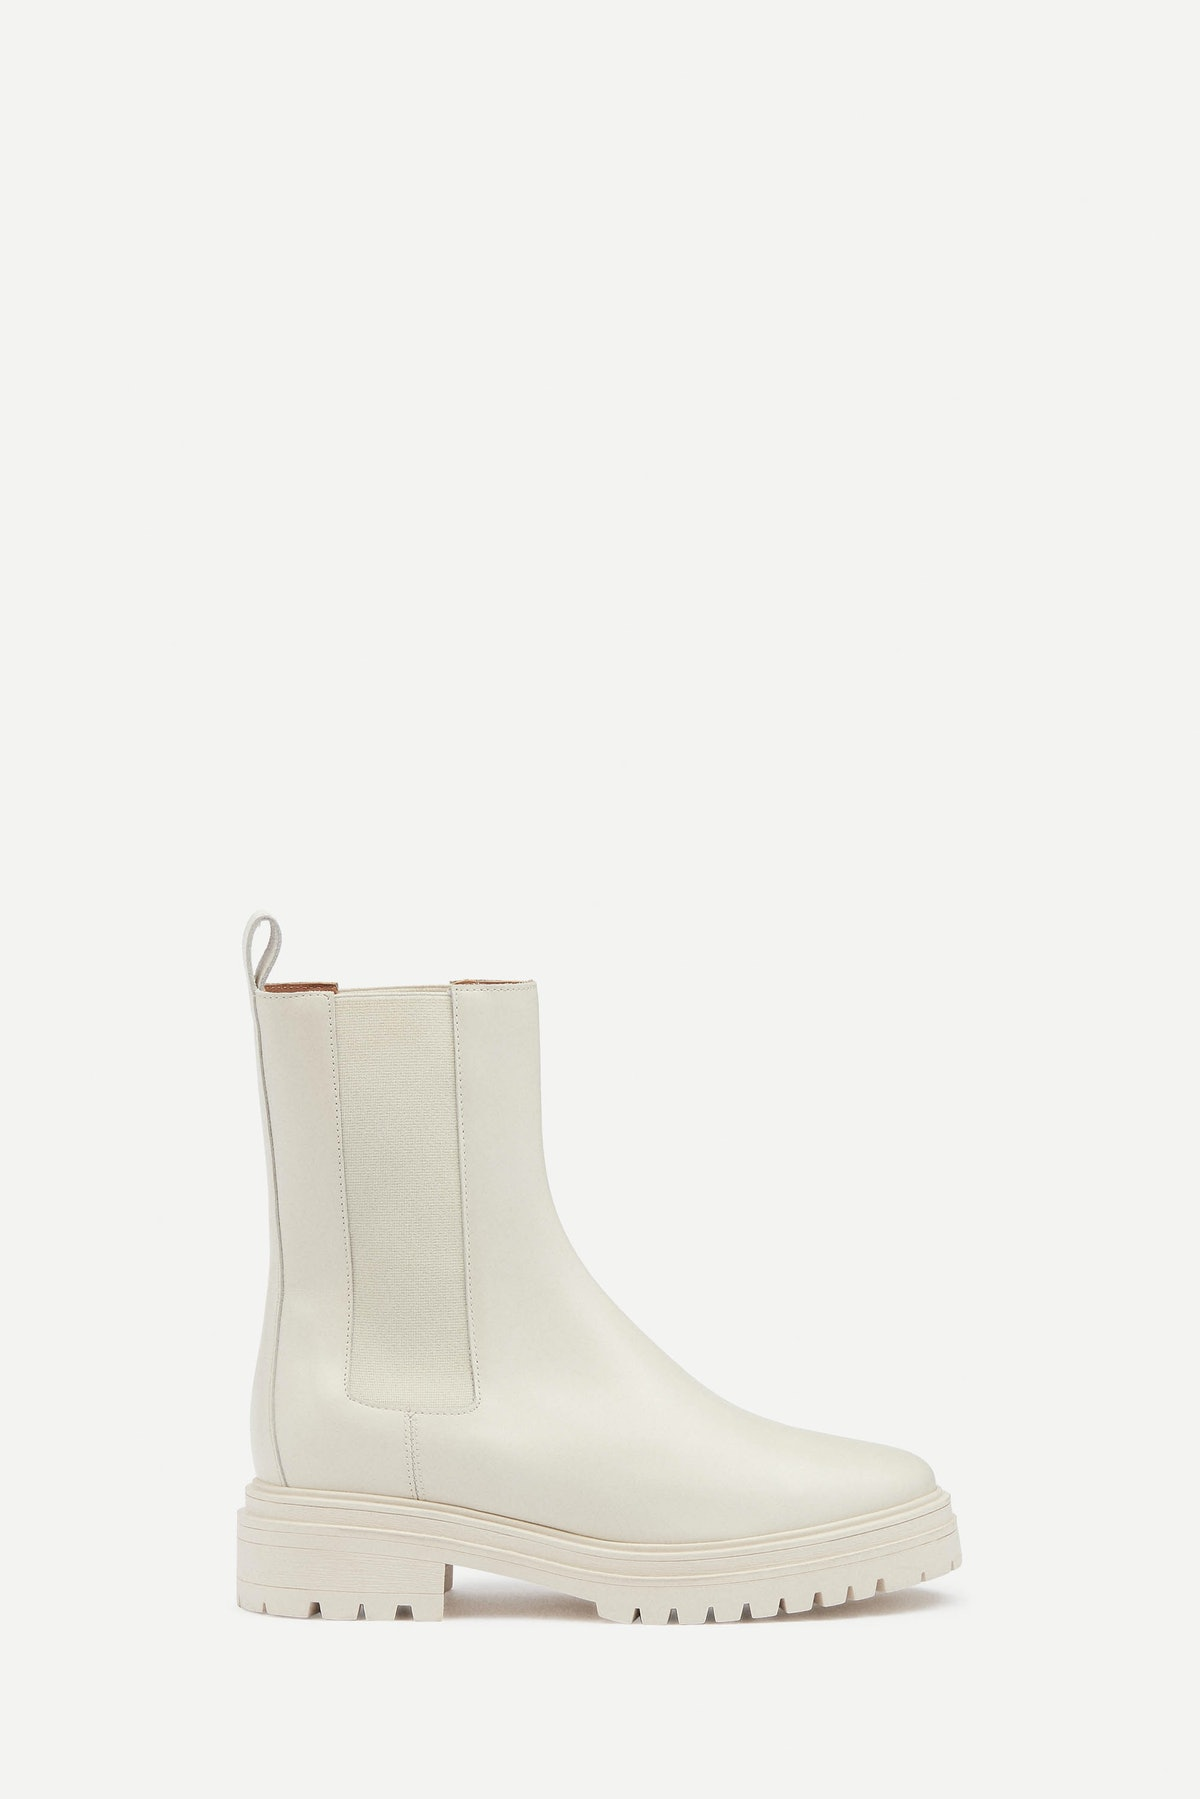 Coda Chelsea Boots in Off-White